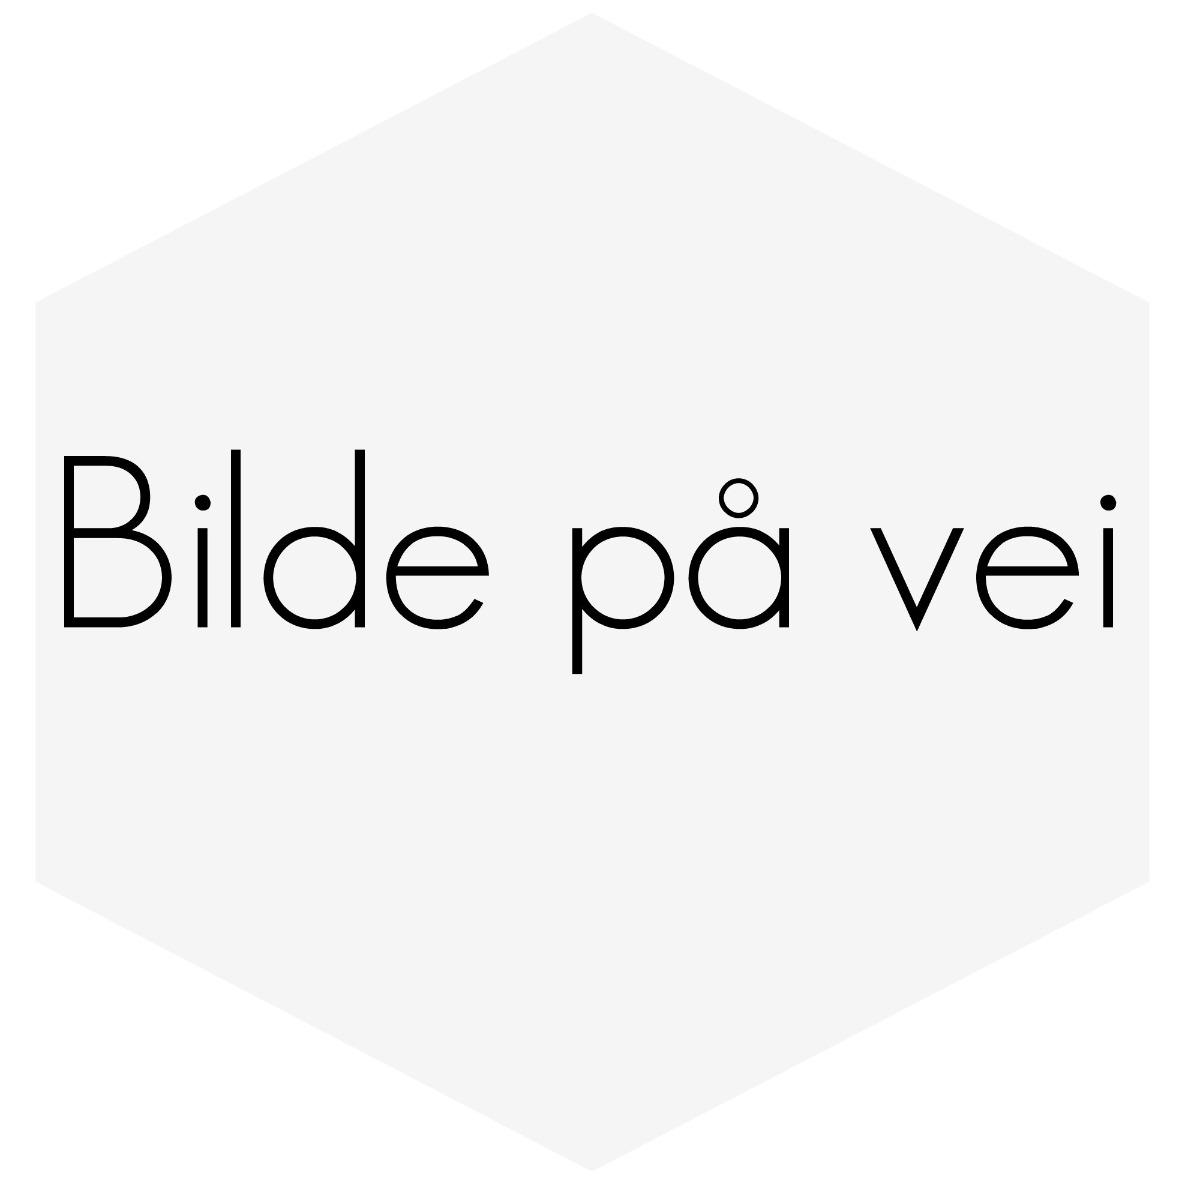 "SILIKONSLANGE DESIMETERVARE BLÅ 4"" (102MM)"